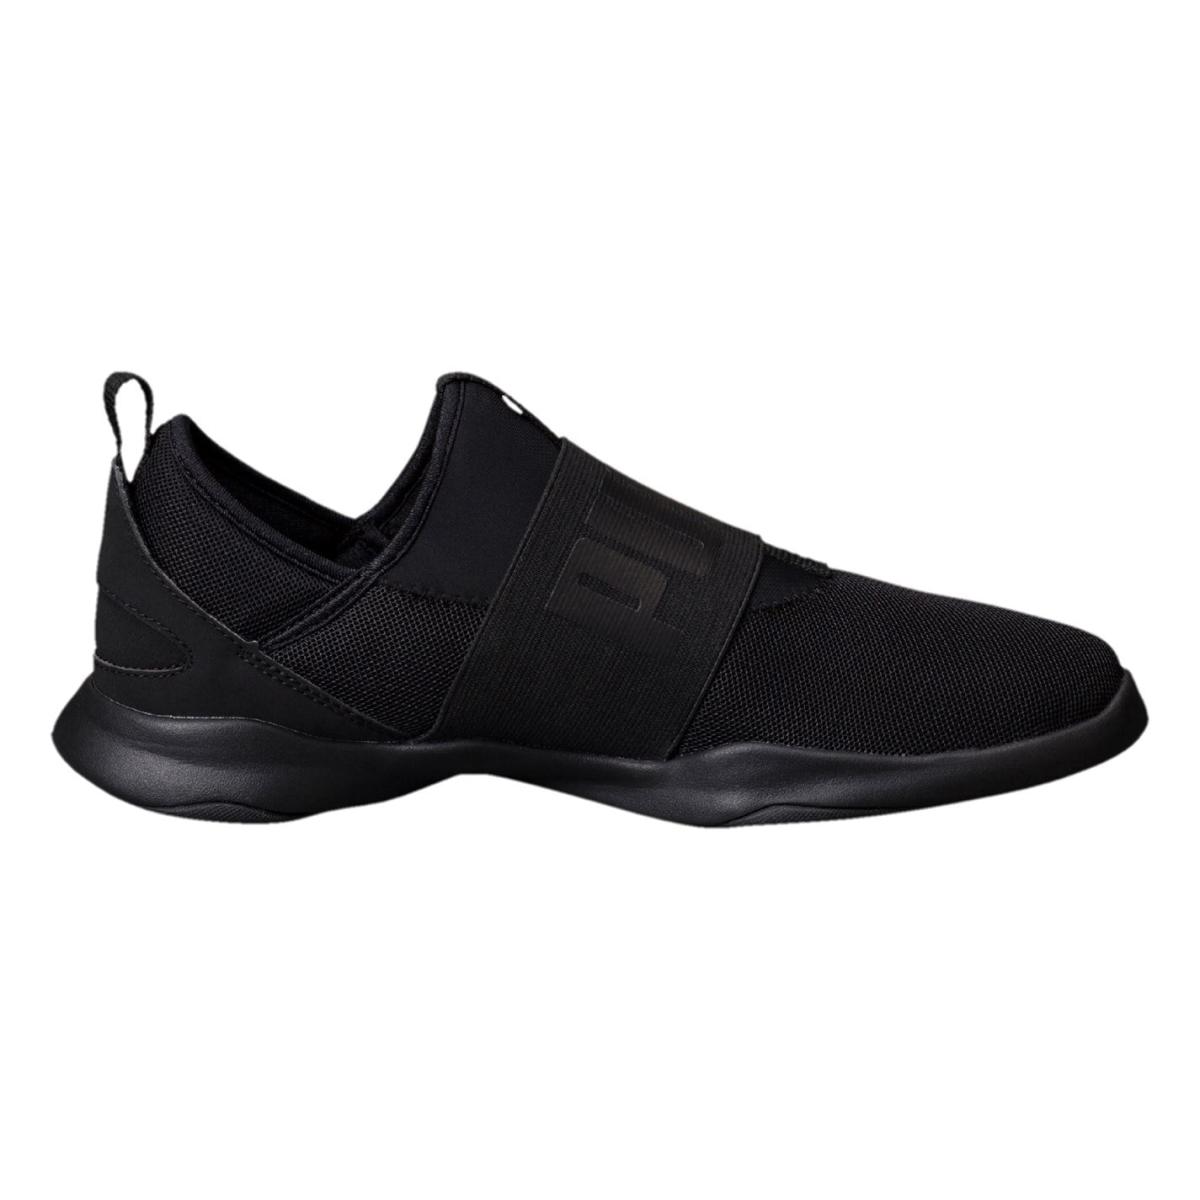 Puma-Dare-Turnschuhe-Laufschuhe-Damen-Sneaker-Trainers-Sportschuhe-5890 Indexbild 4